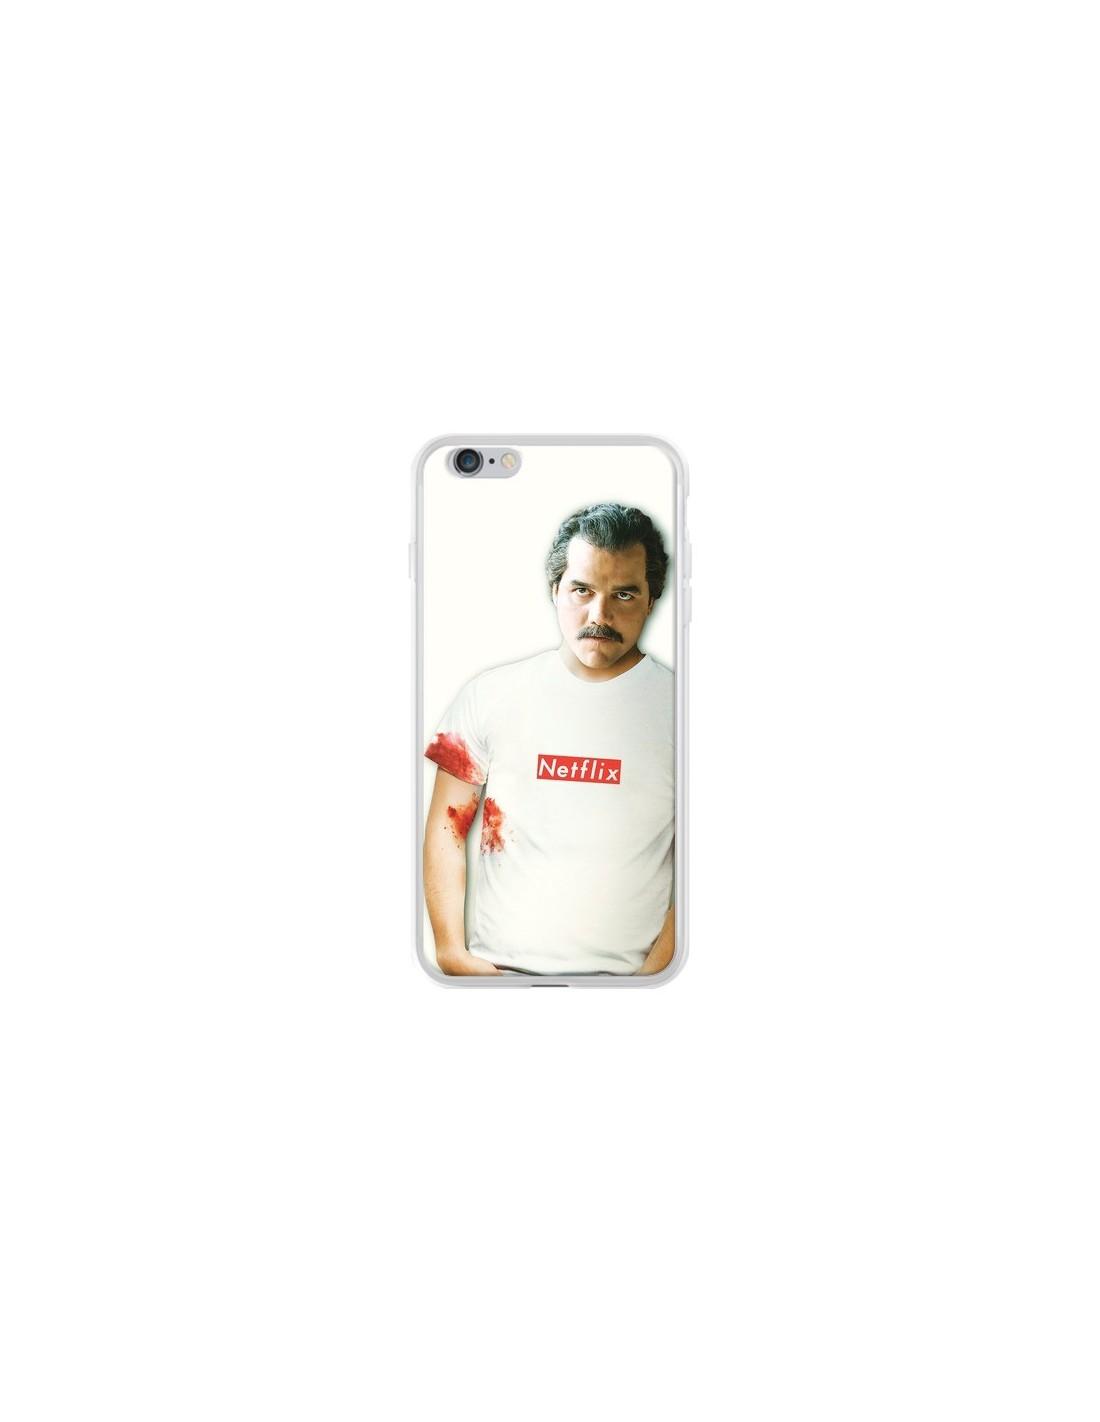 coque netflix iphone 6 plus